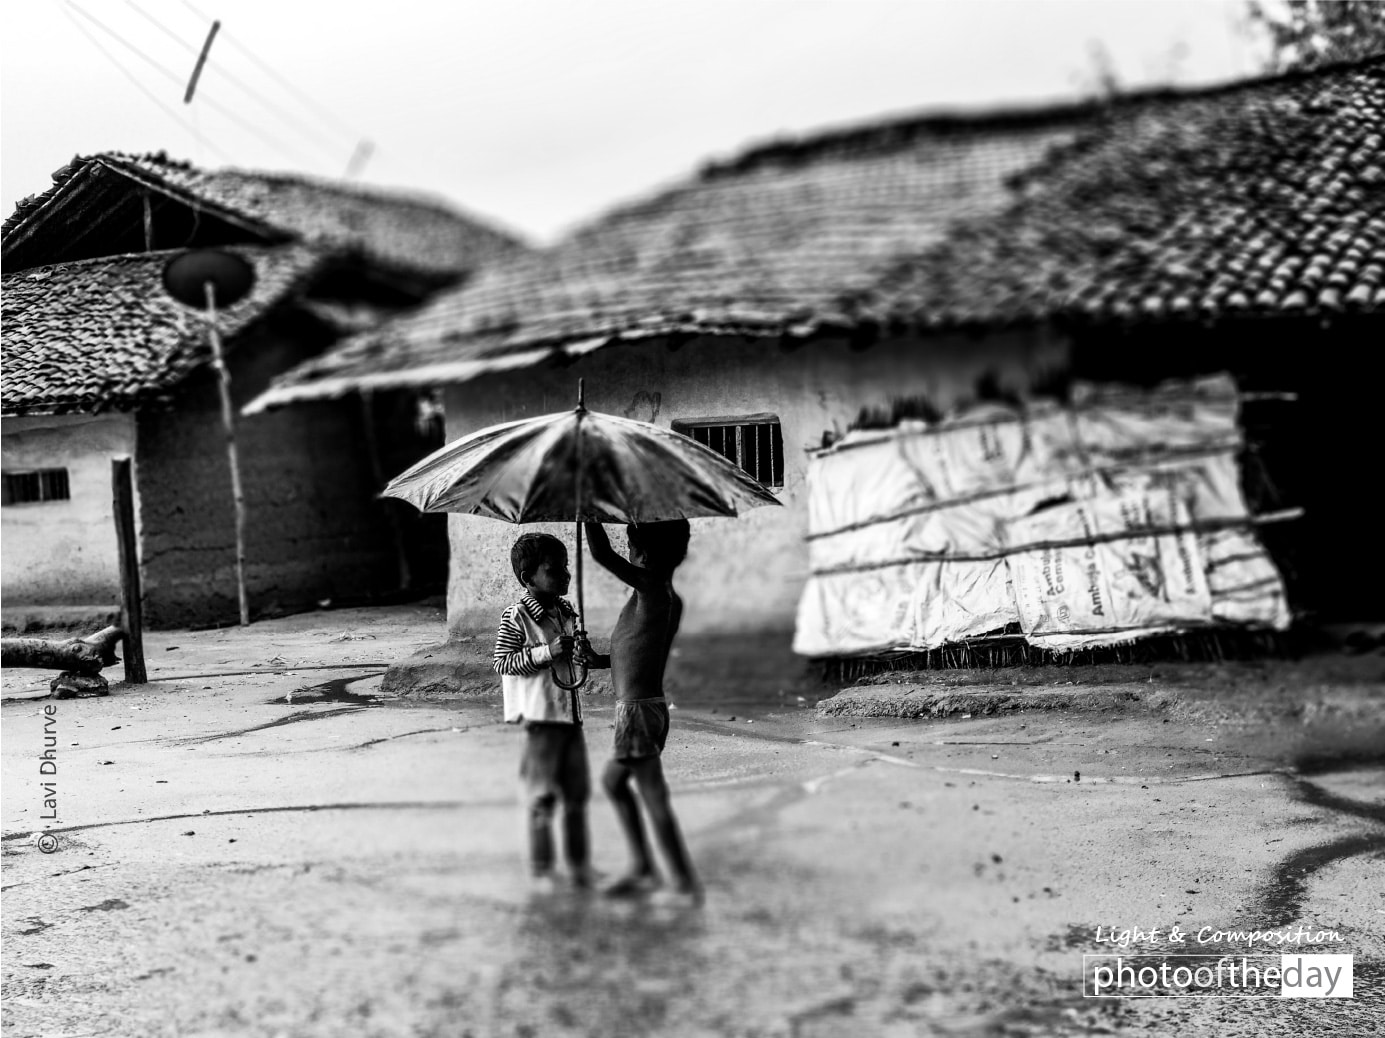 Fixing Umbrella, by Lavi Dhurve